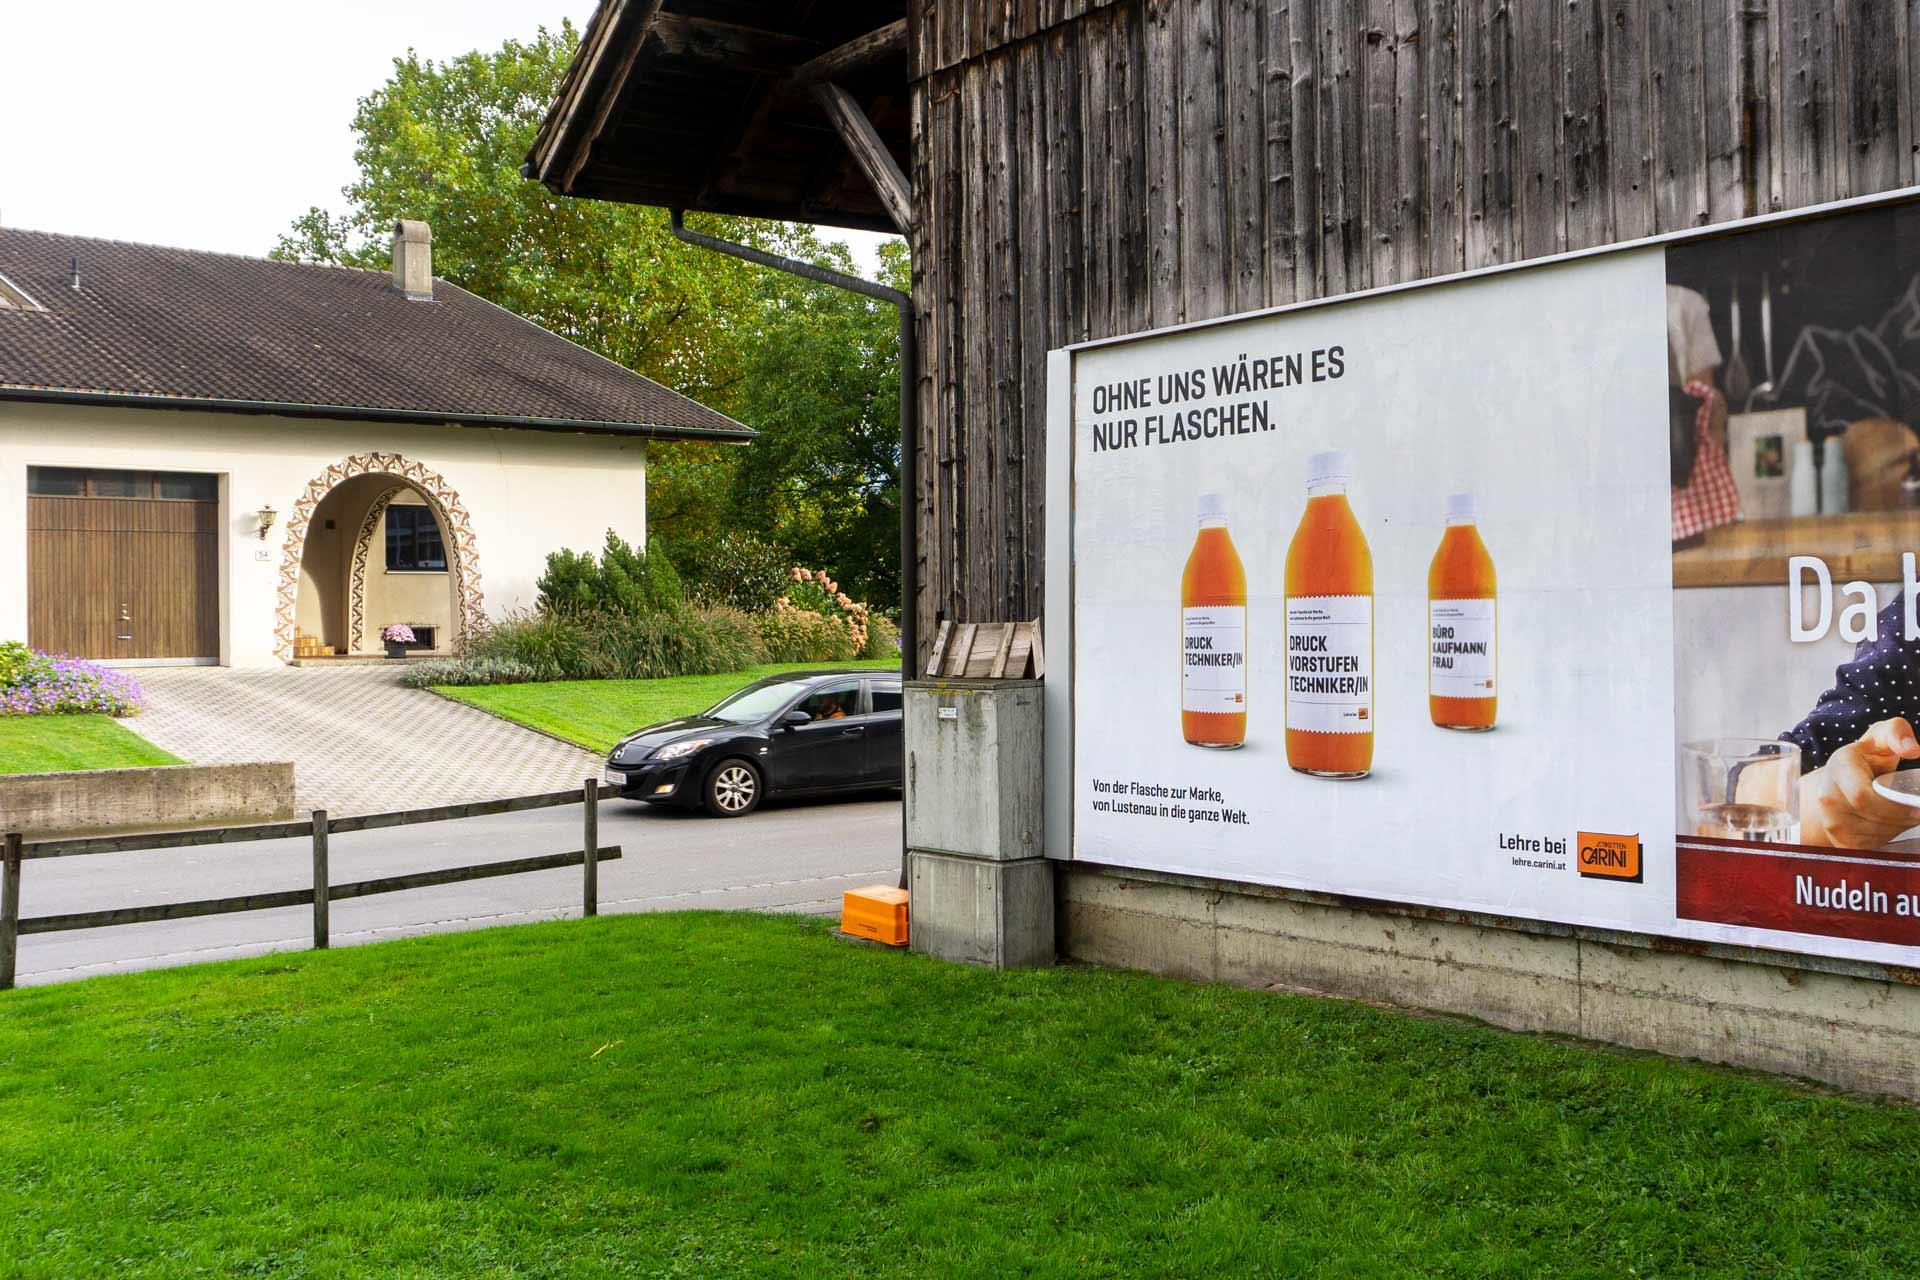 Etiketten CARINI, Plakatkampagne, Bernhard Hafele, viergestalten